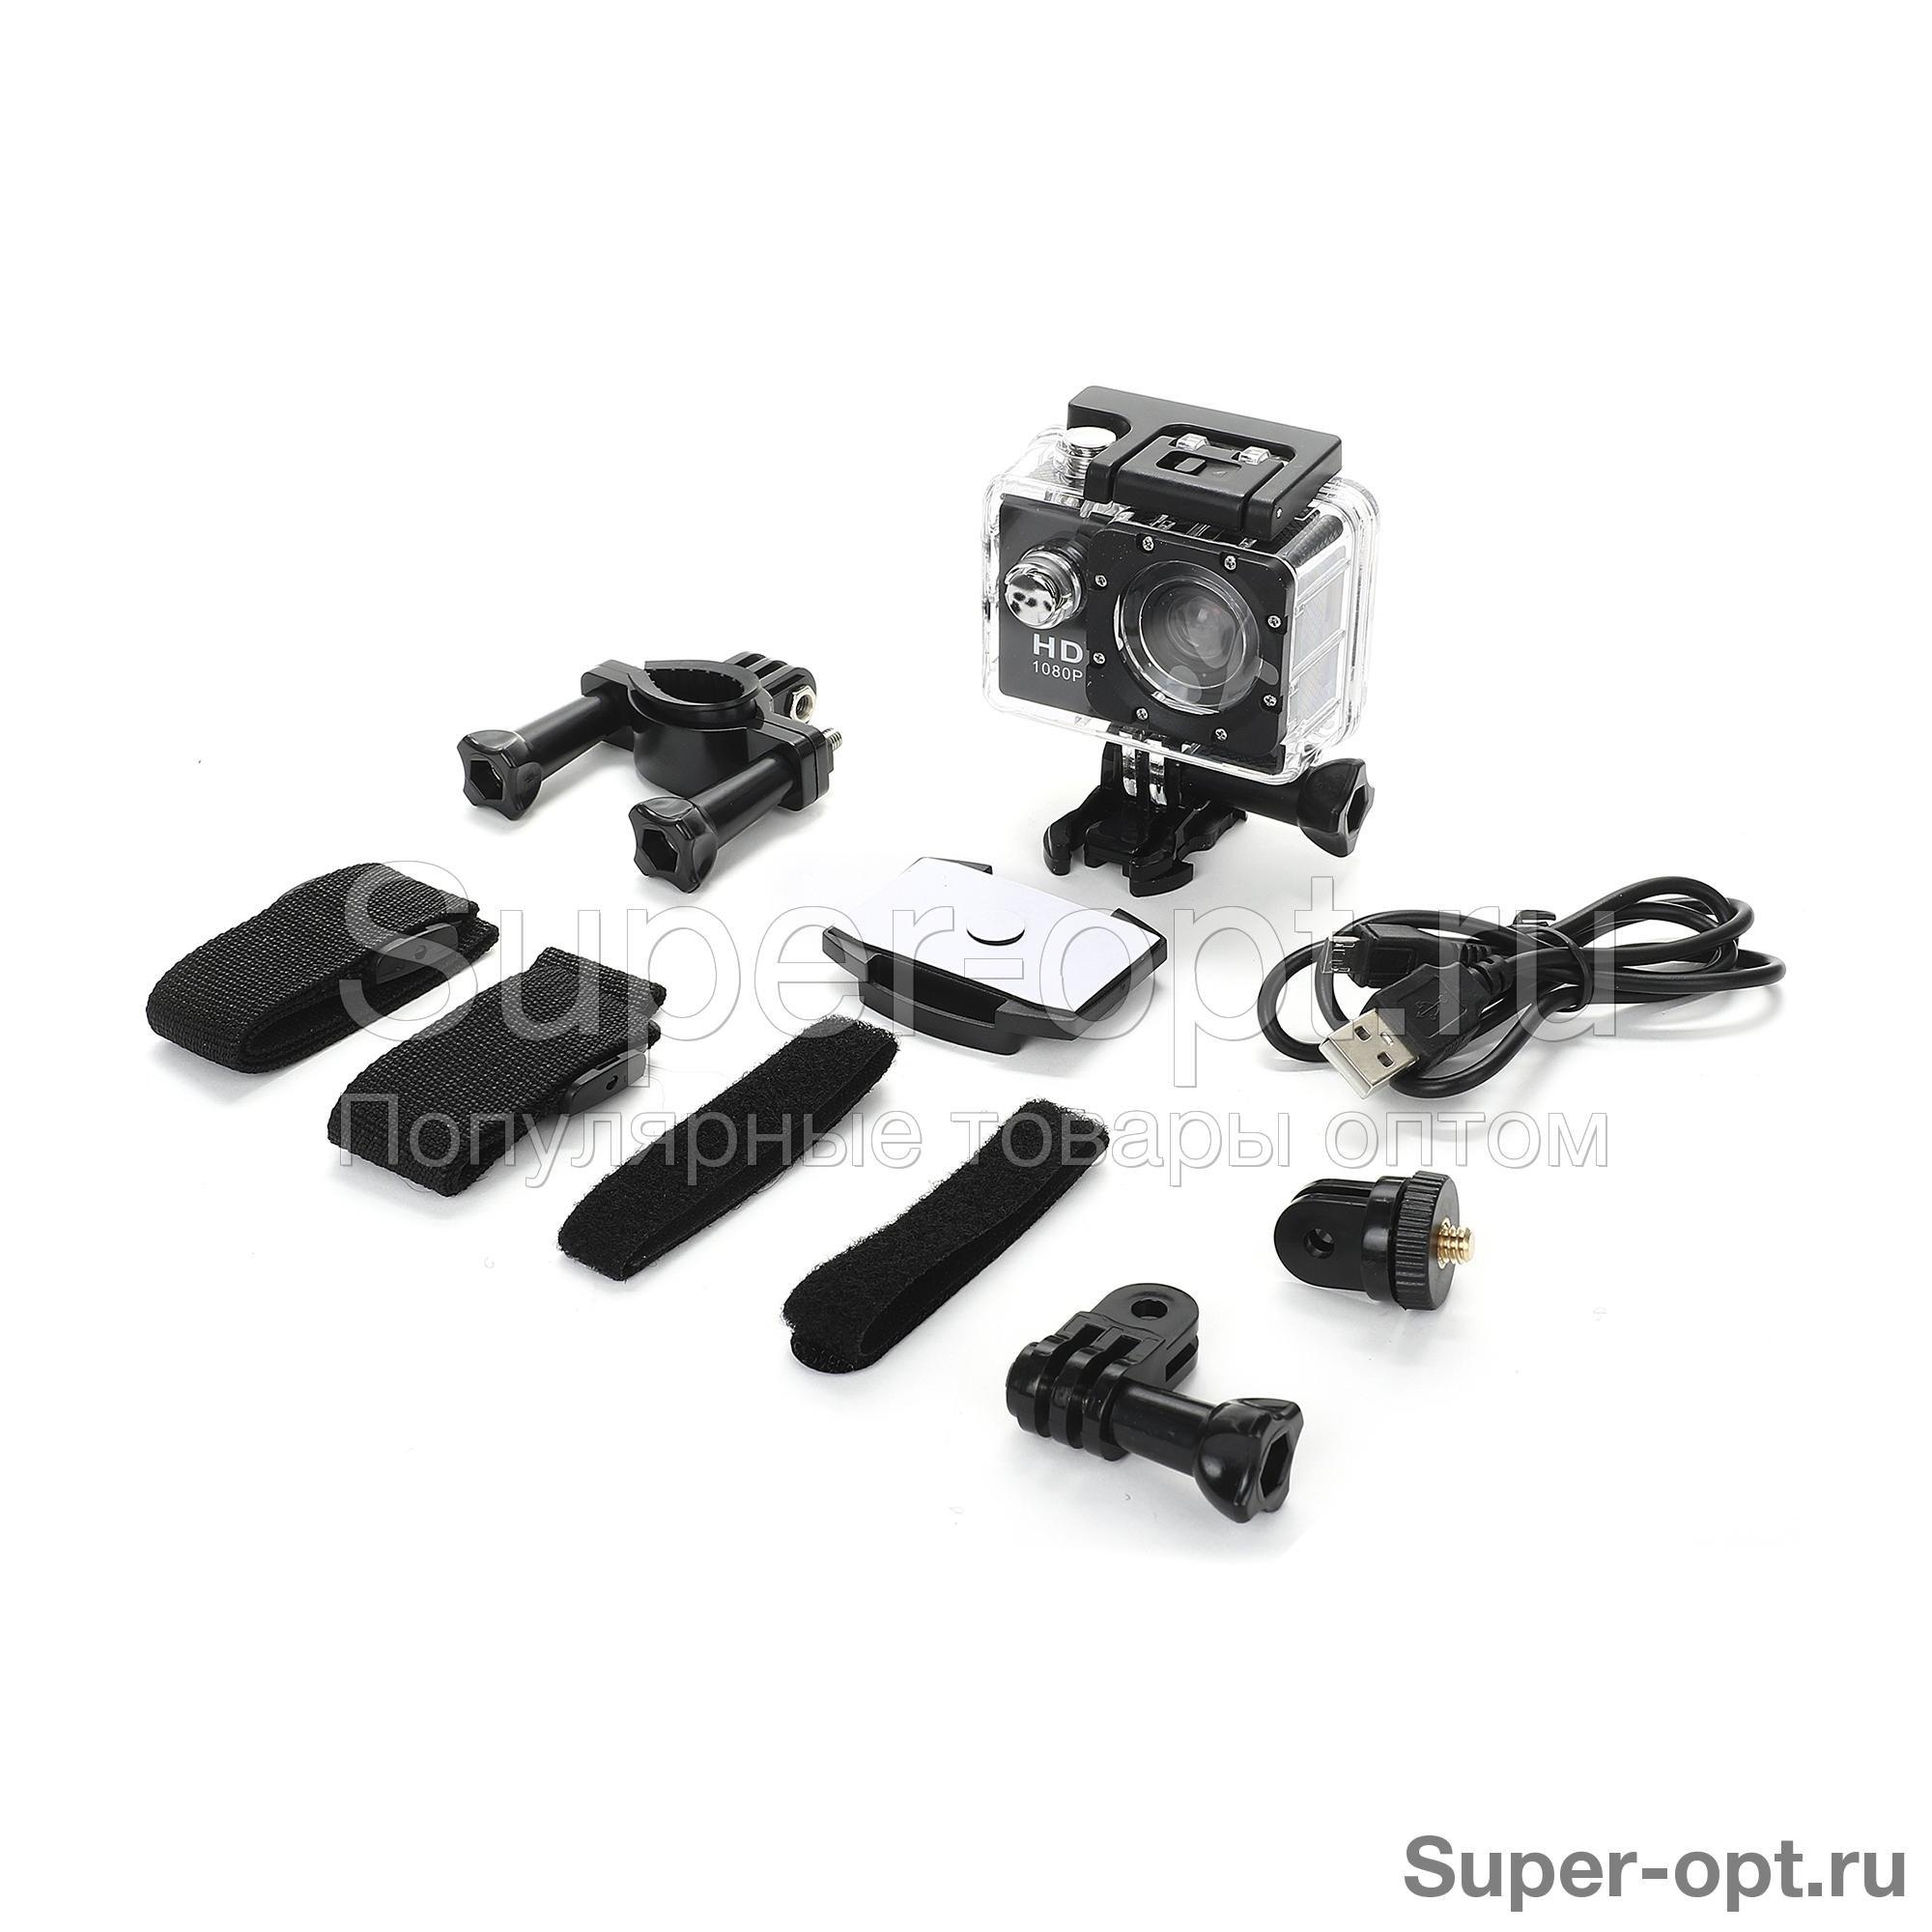 Экшн камера Sports Cam A7 оптом